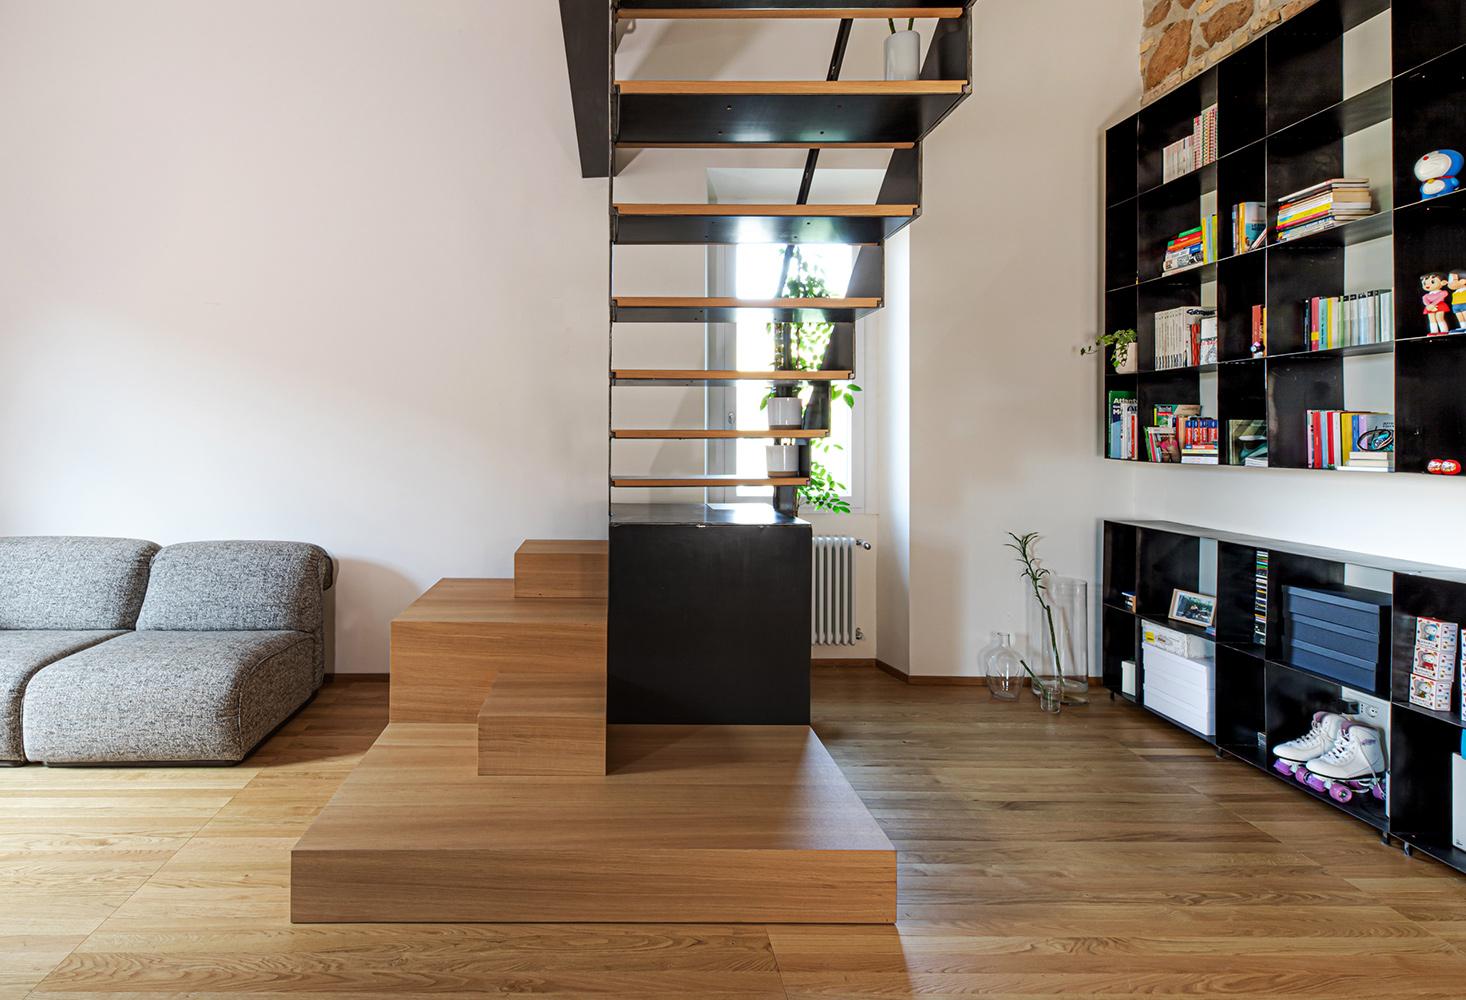 parquet Matita collection, European Oak Select,brushed varnished